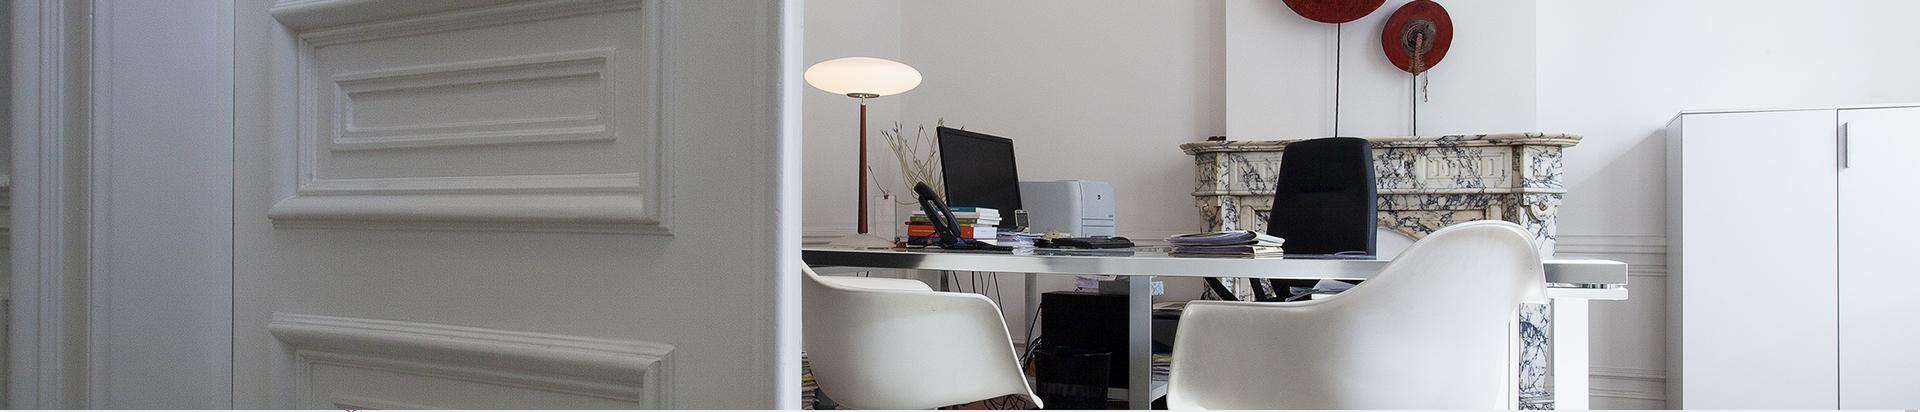 relations sociales et s curit sociale cabinet d 39 avocats mosal li ge. Black Bedroom Furniture Sets. Home Design Ideas